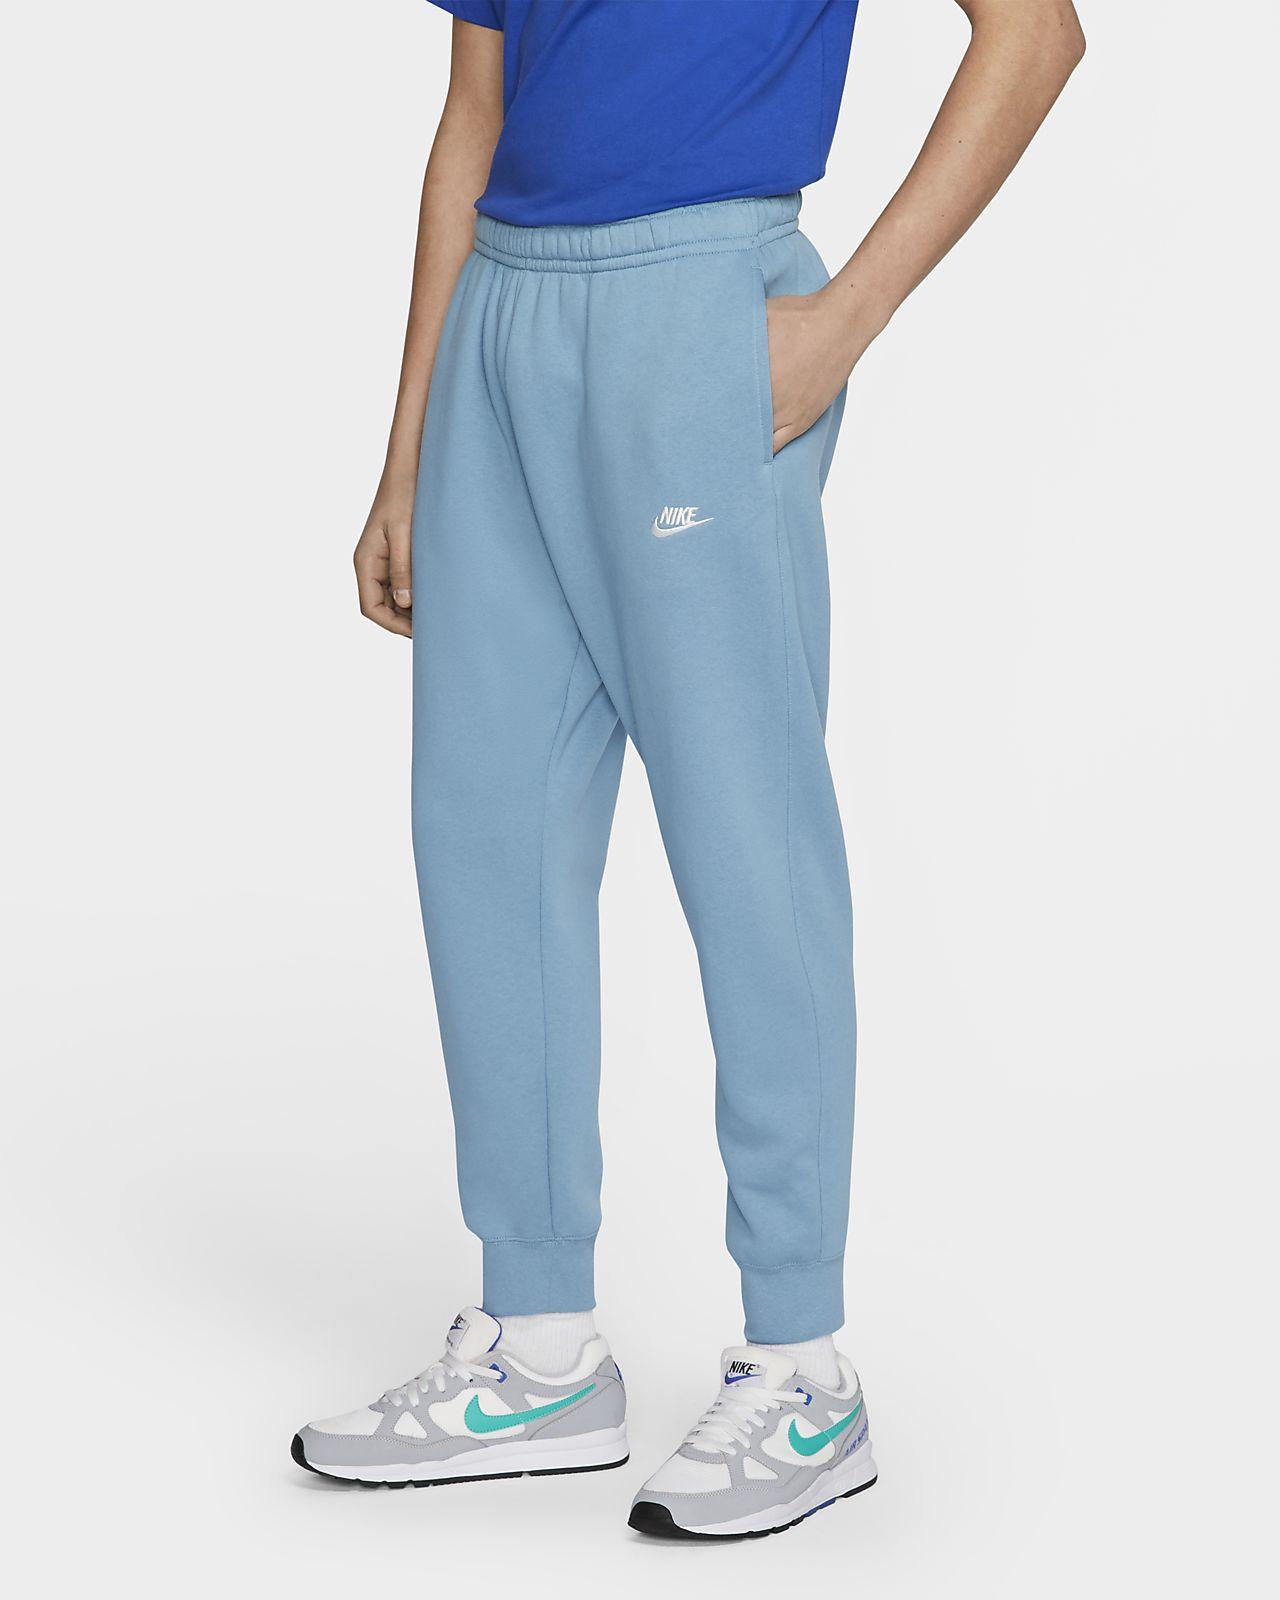 Fleece Active Joggers Elastic Pants I Am The Best Sweatpants for Boys /& Girls